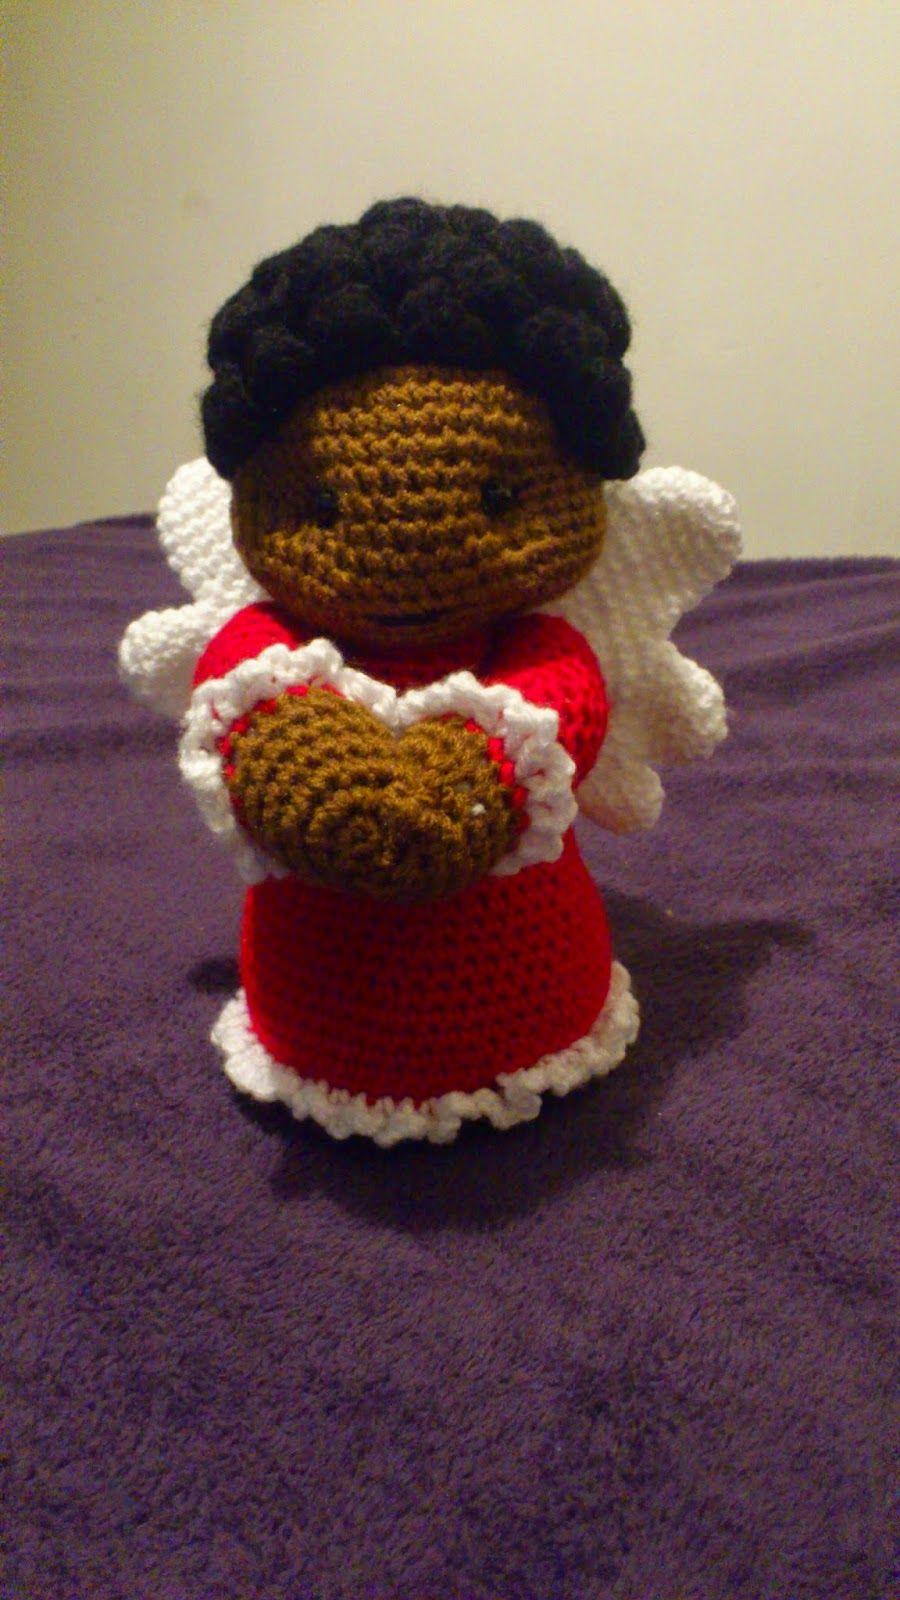 Amigurumi Black Angel - FREE Crochet Pattern / Tutorial   FREE ...